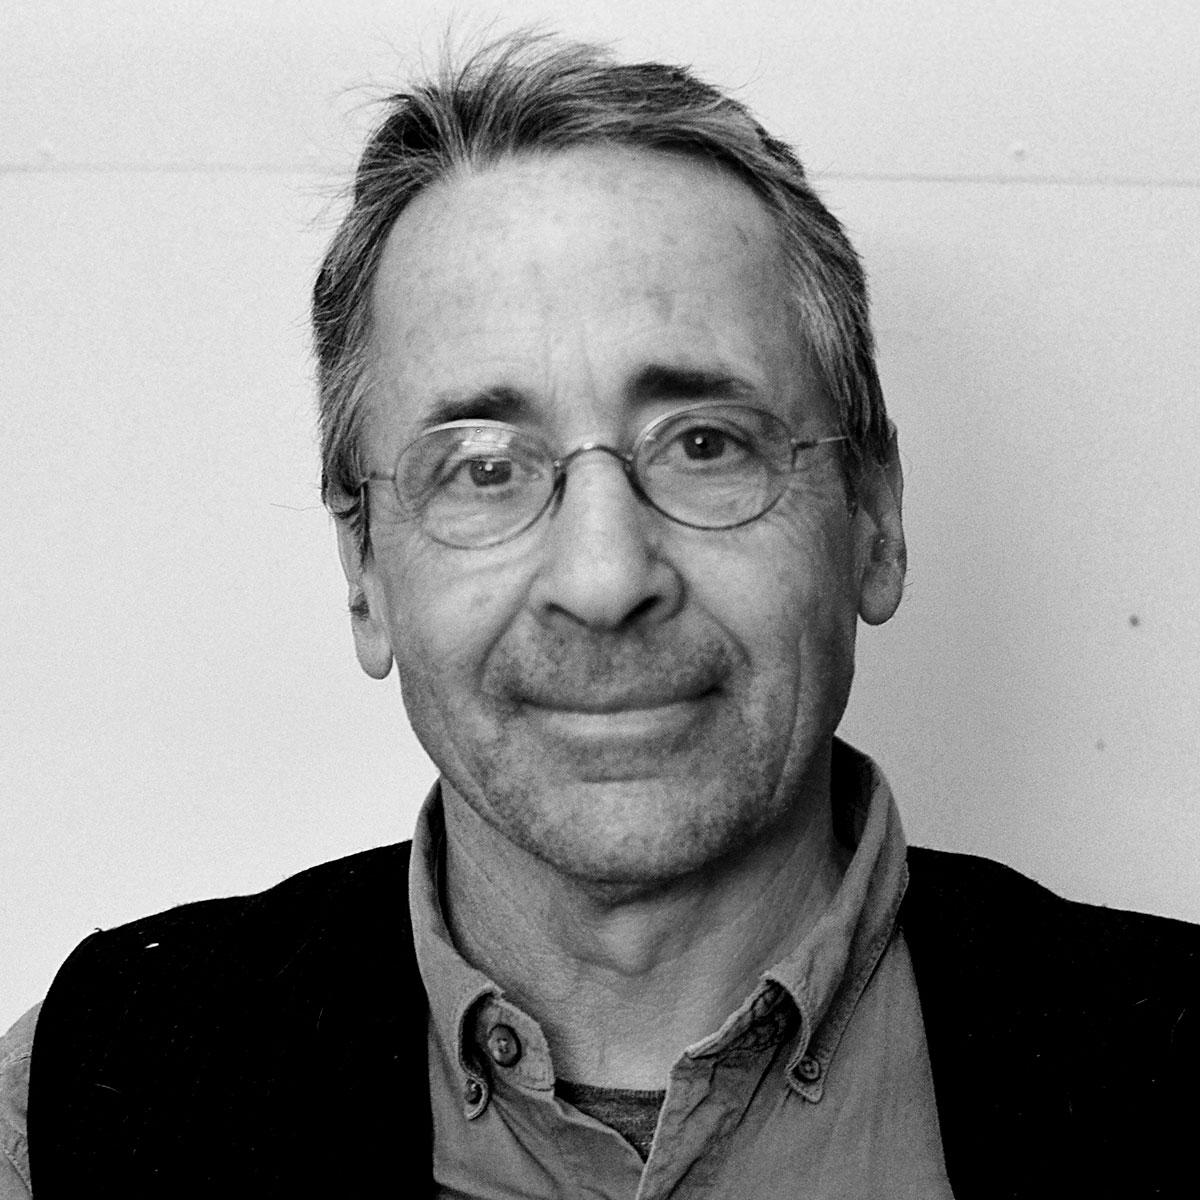 Paul Molyneaux